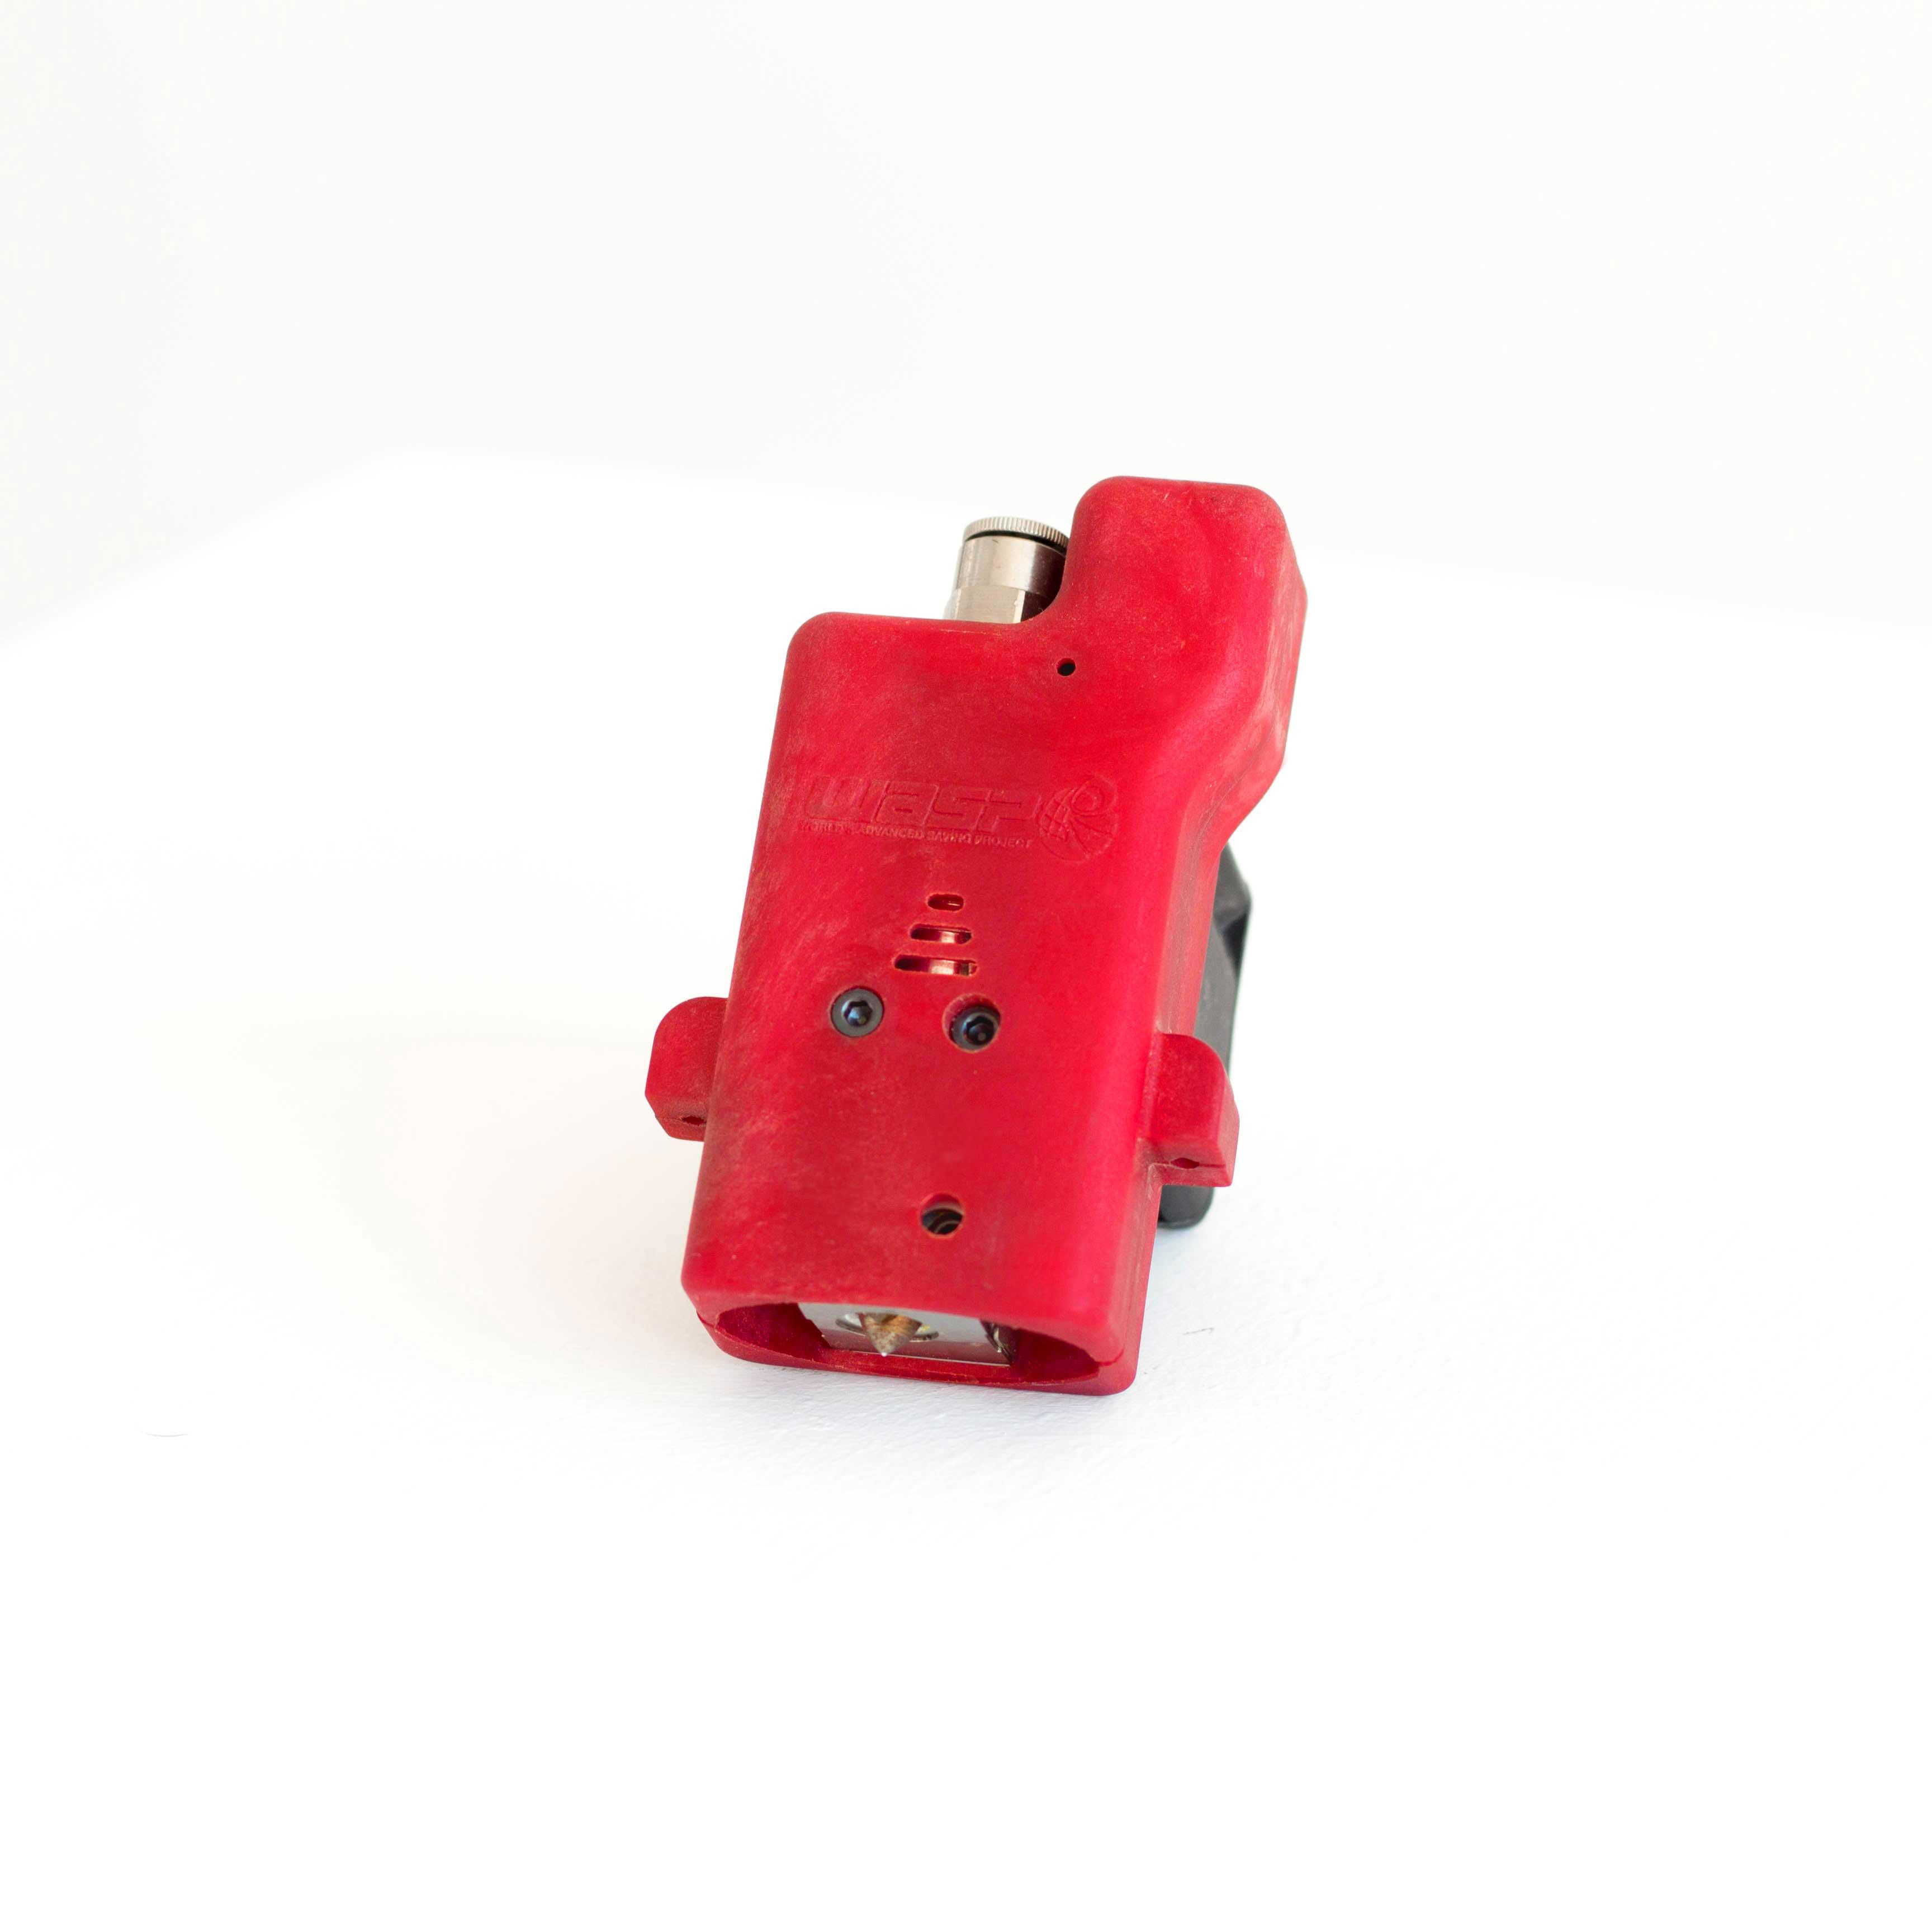 estrusore stampante 3d -SPITFIRE-RED-EXTEUDER-WASP